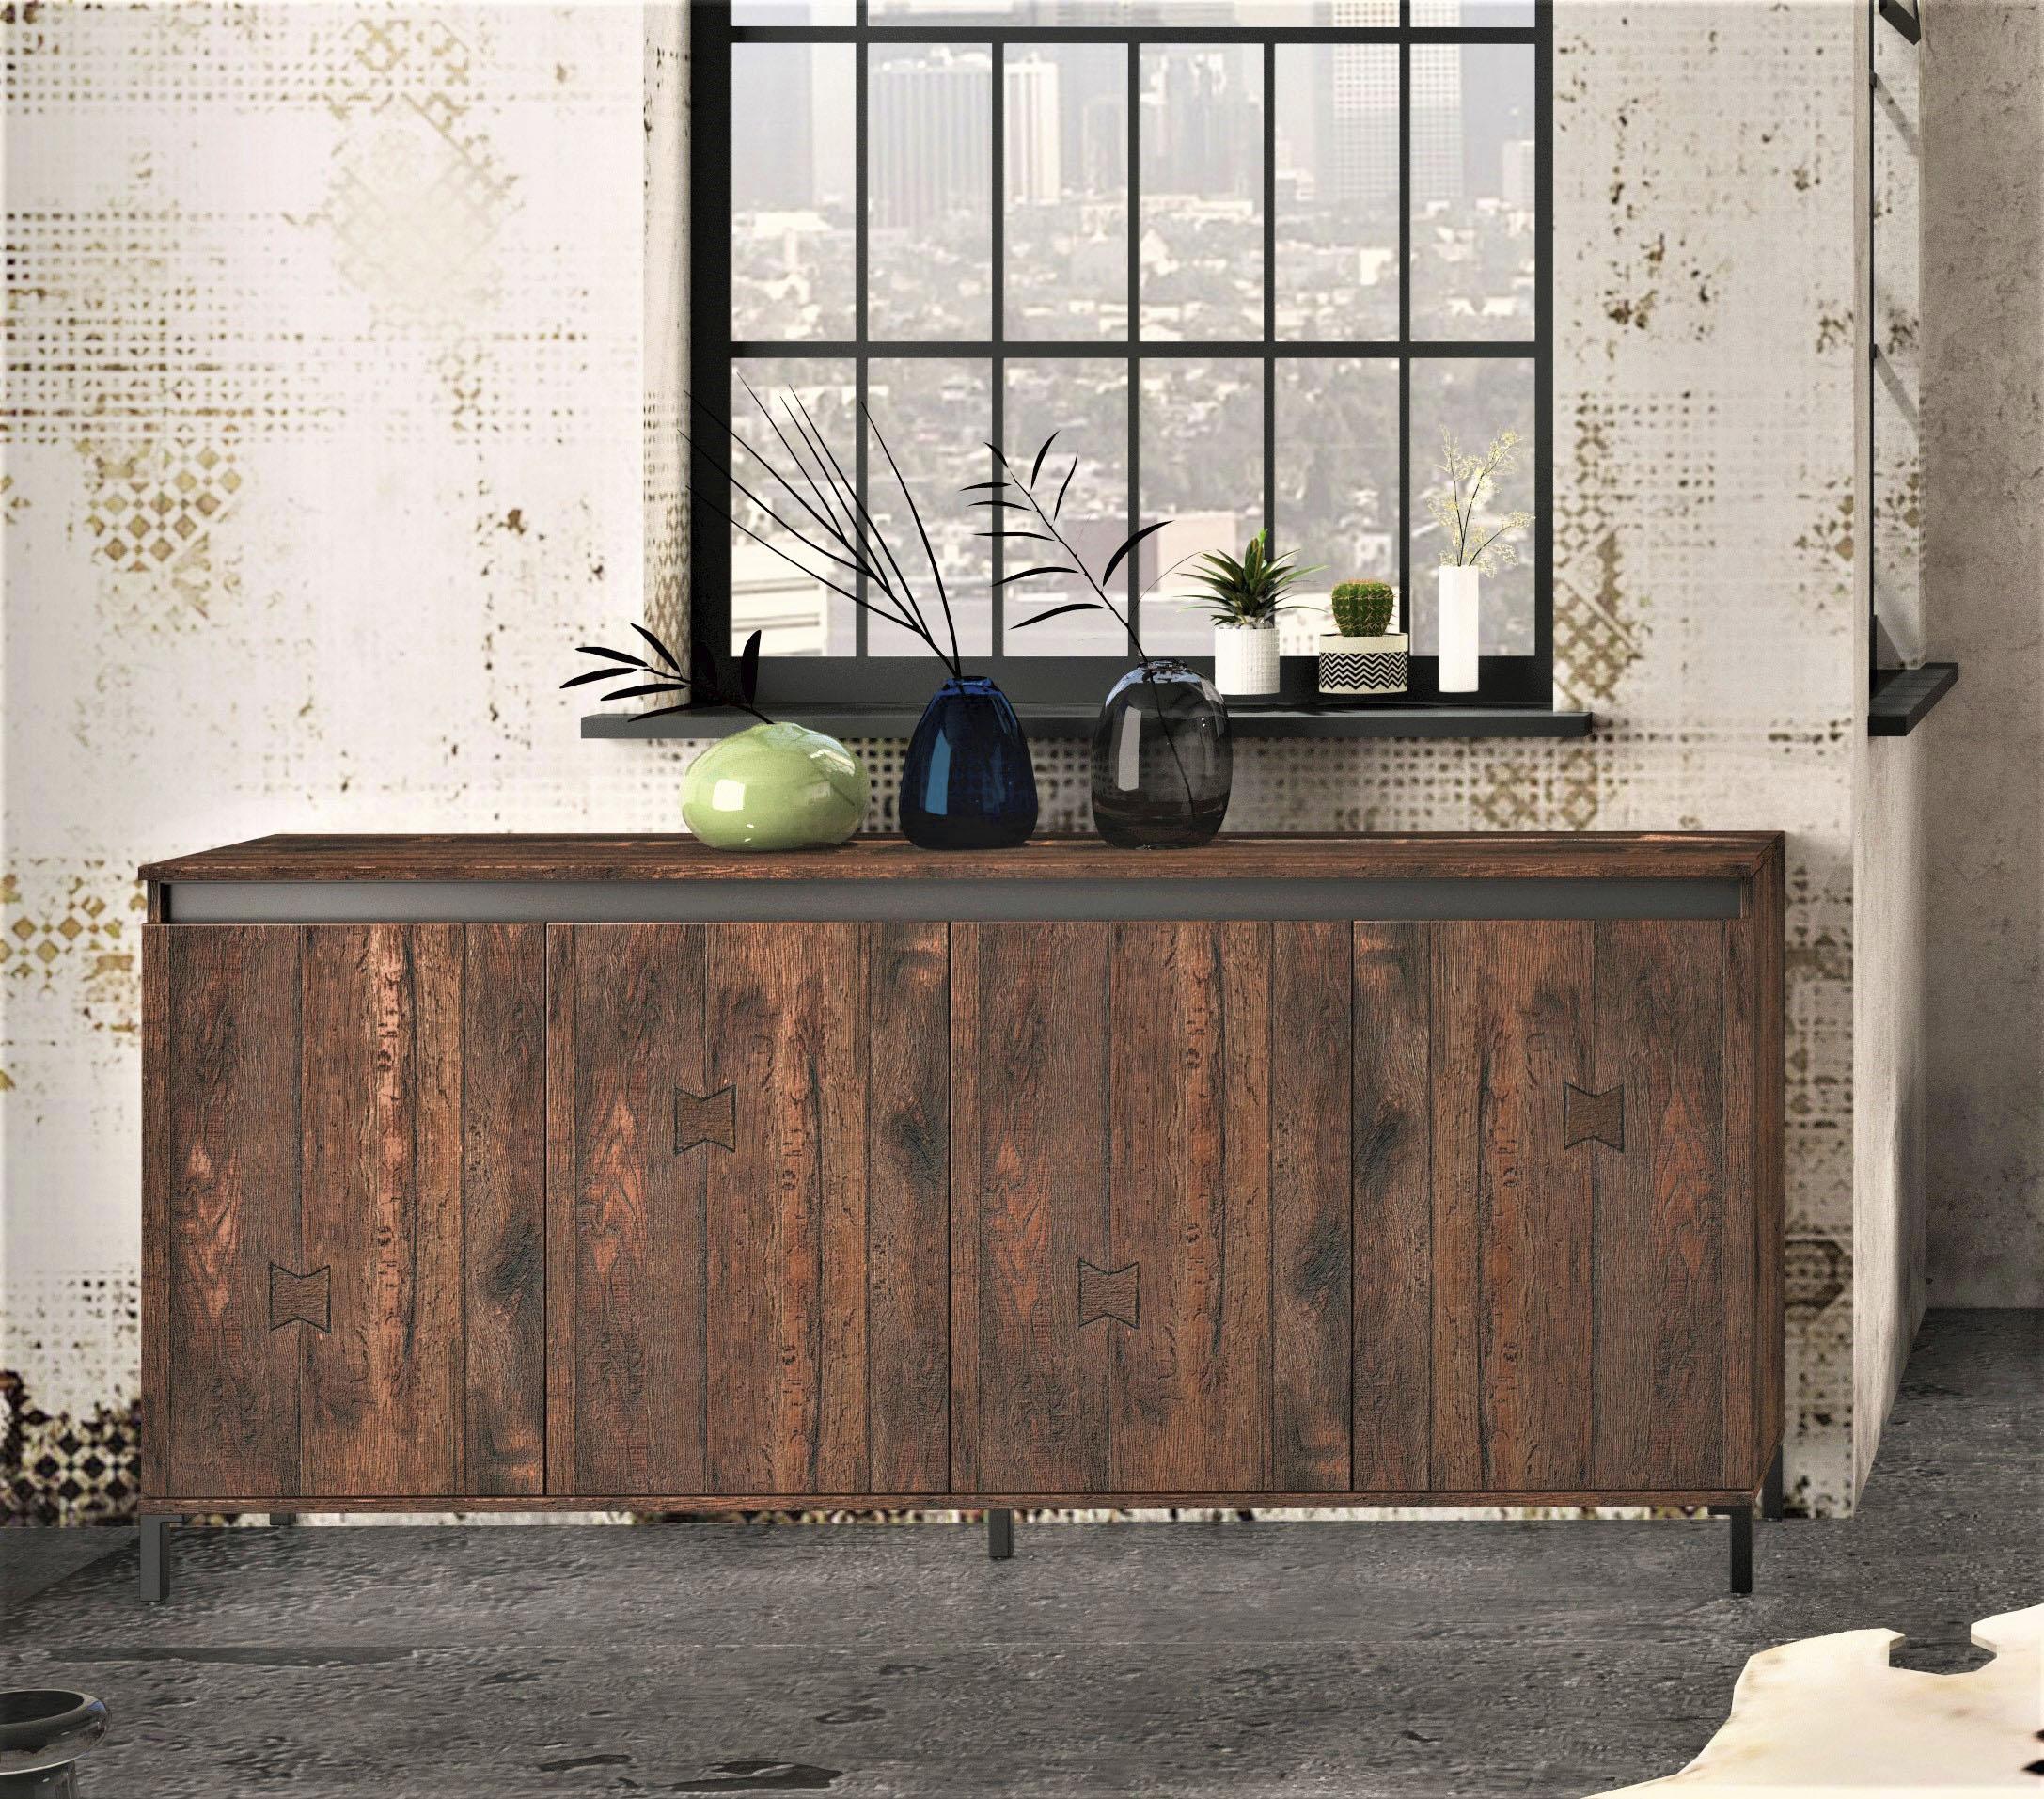 KITALY Sideboard Genio Industrial | Wohnzimmer > Schränke > Sideboards | Kitaly